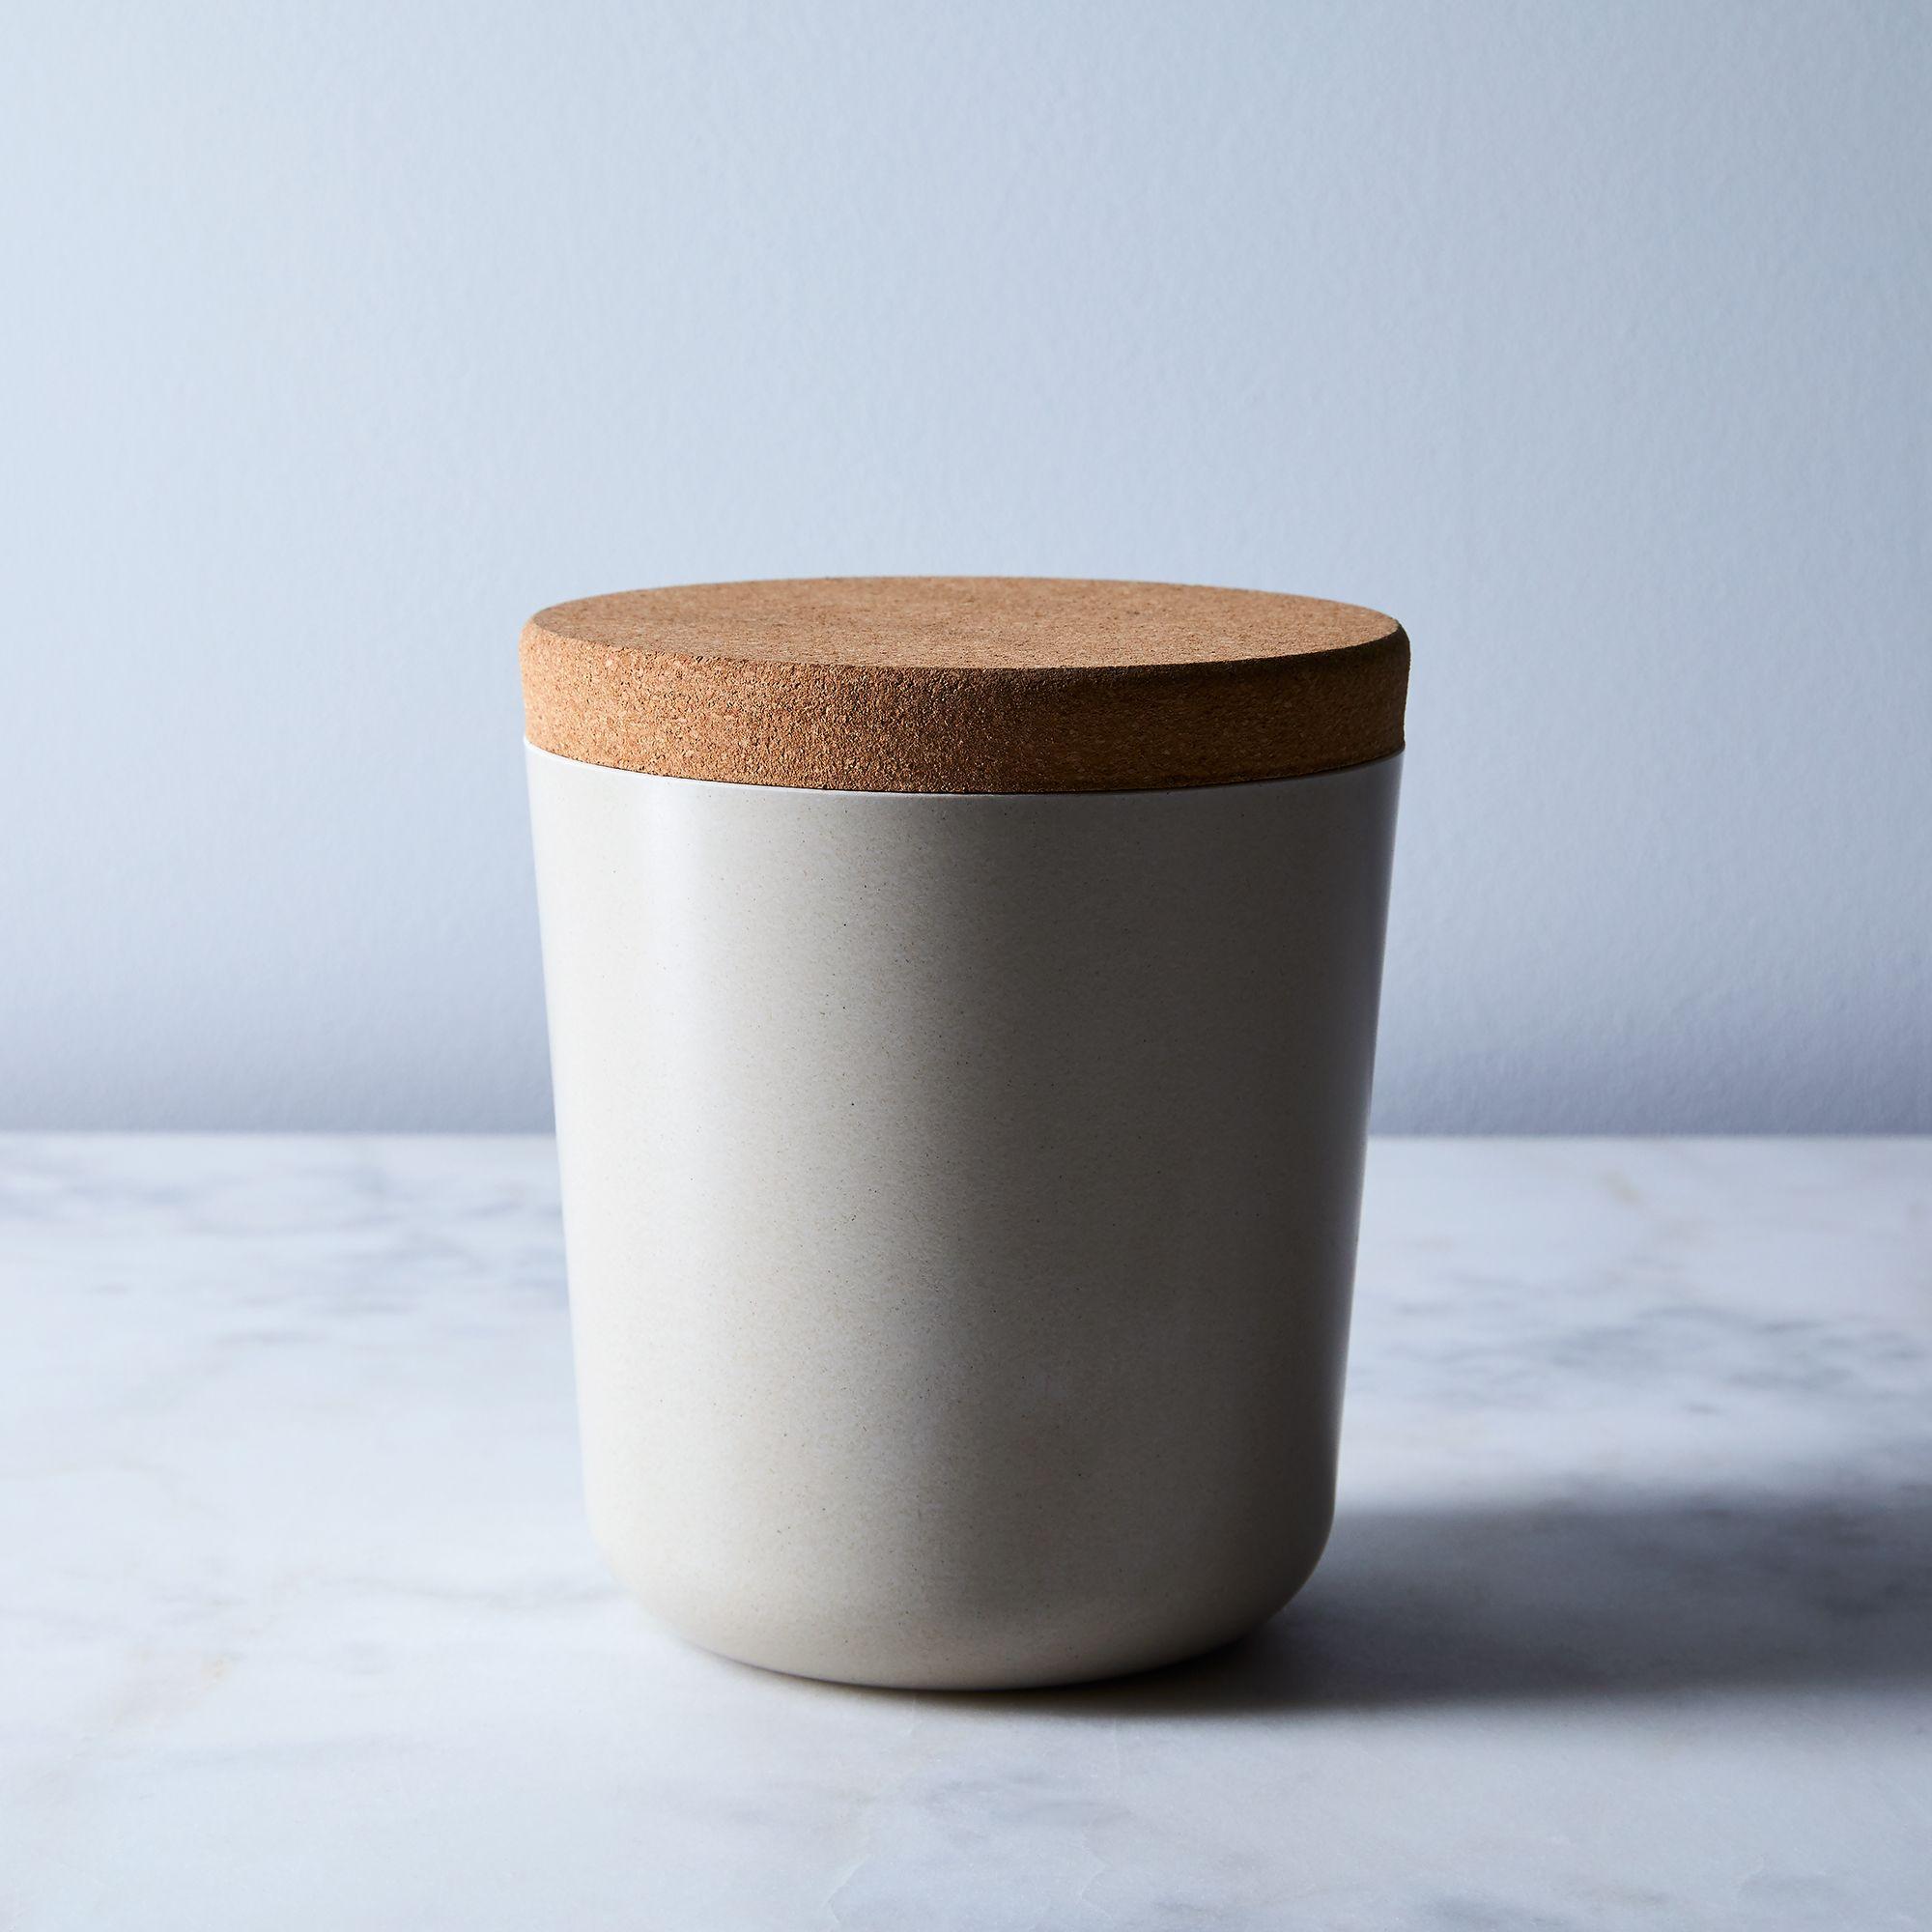 6ee57b75 df3d 4cdc 92b5 4d381f43f20b  2017 1208 ekobo recycled bamboo canisters stone medium silo ty mecham 001